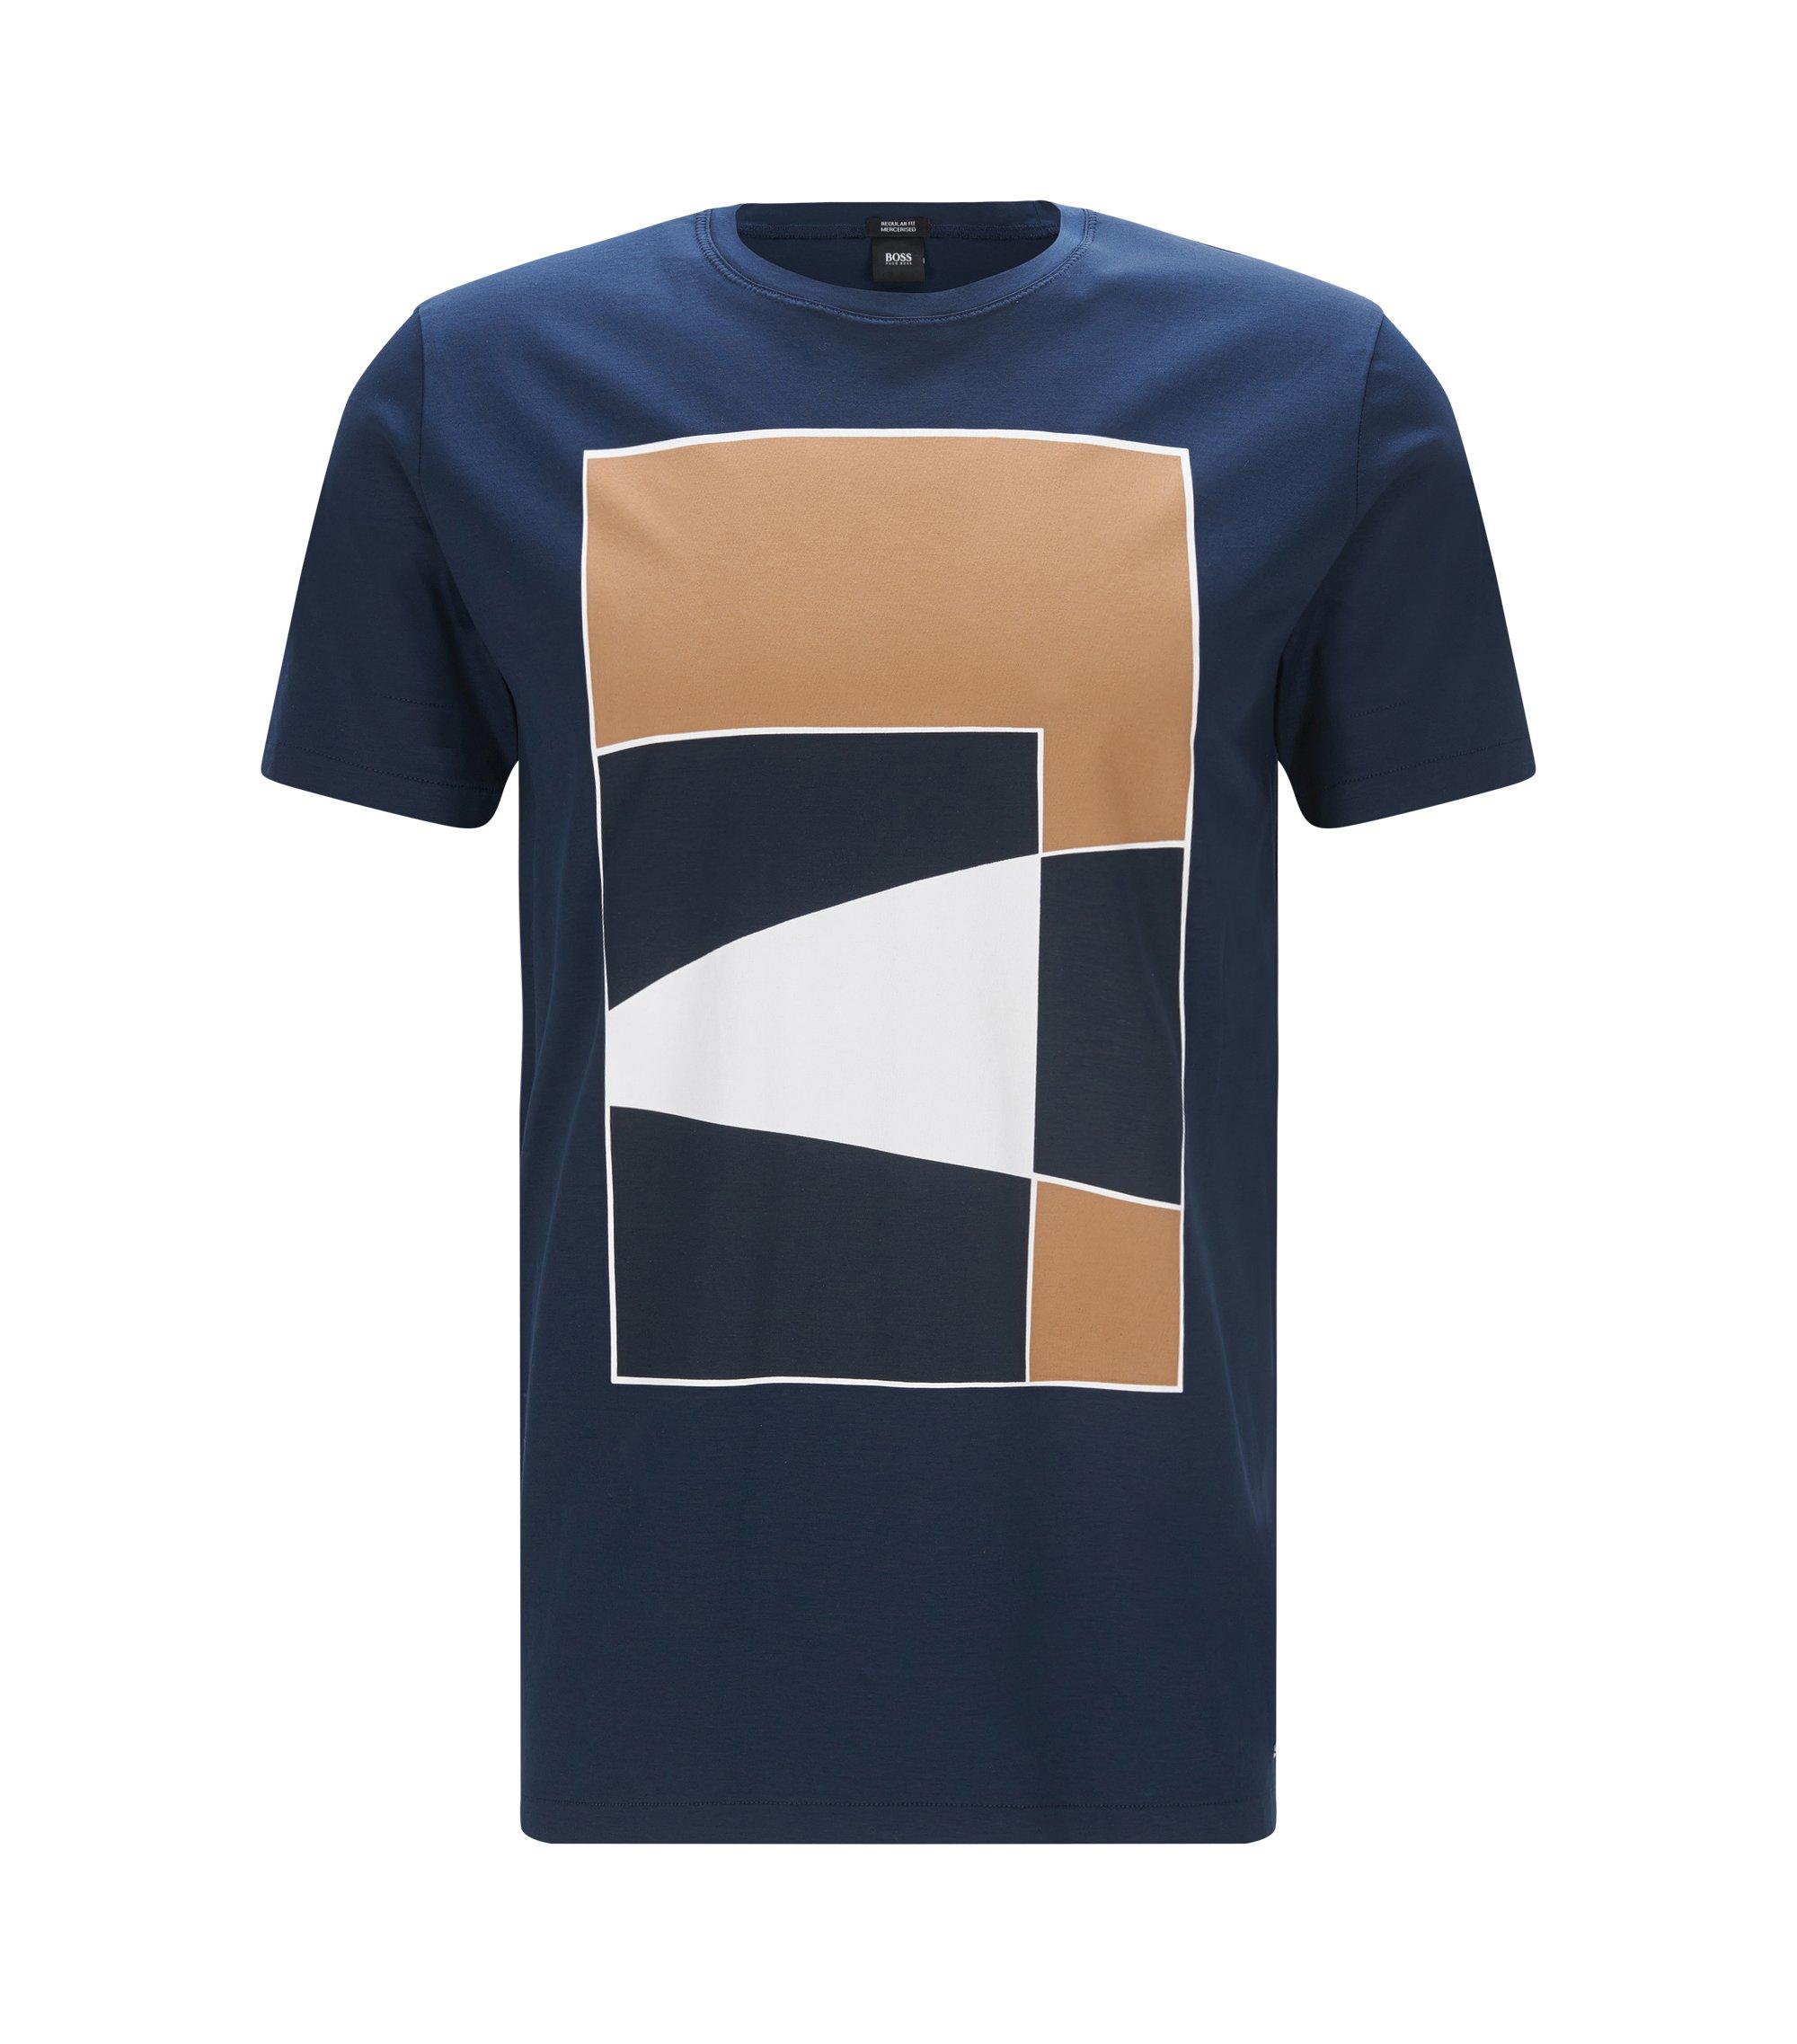 Cotton Graphic T-Shirt | Tilburt, Dark Blue